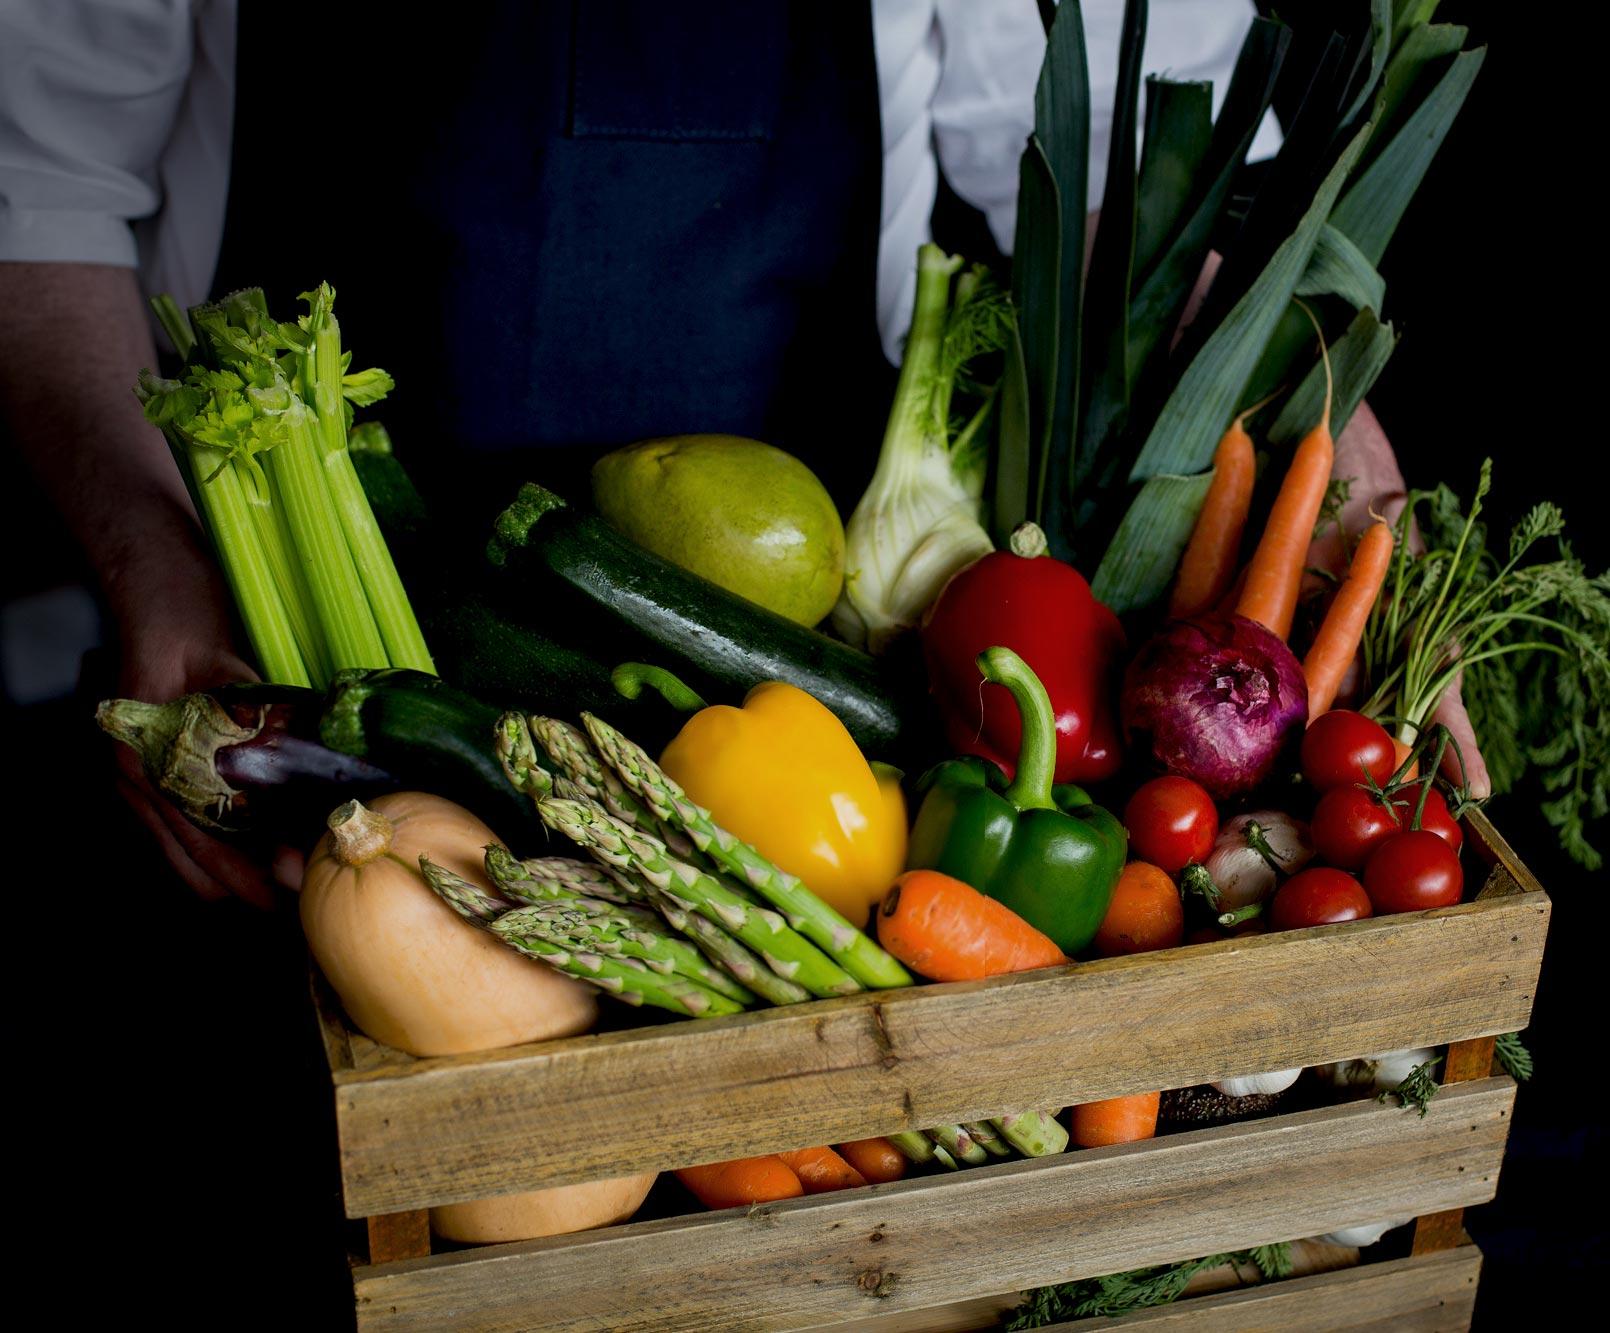 079 Master Chef Web 2019© Anita Murphy 2019_edit_LO.jpg